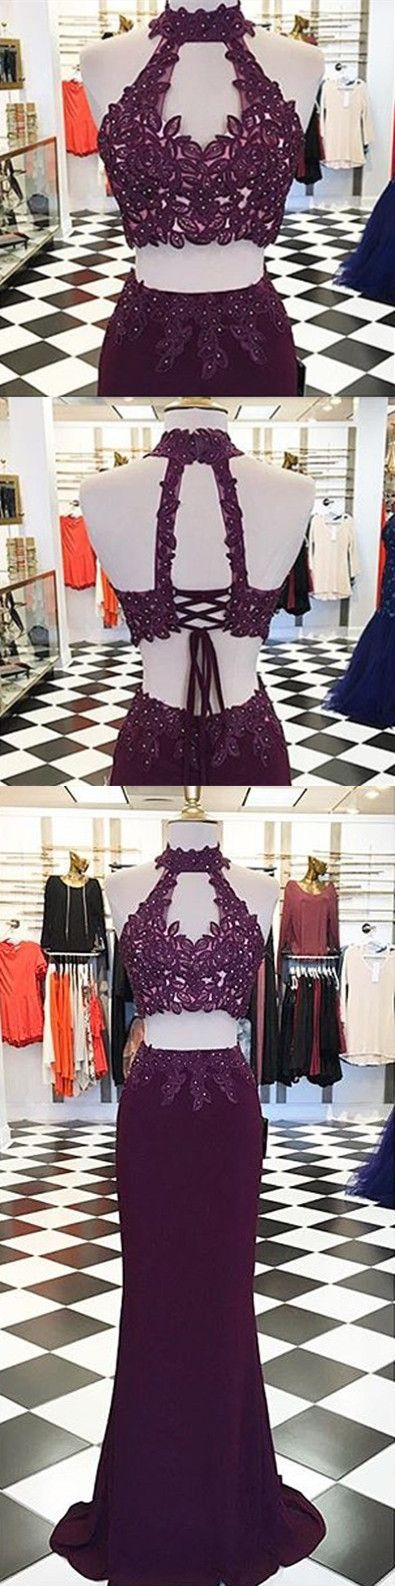 2017 new prom dresses,two piece prom dresses,elegant long prom dresses,sexy mermaid prom dresses,burgundy prom dresses,